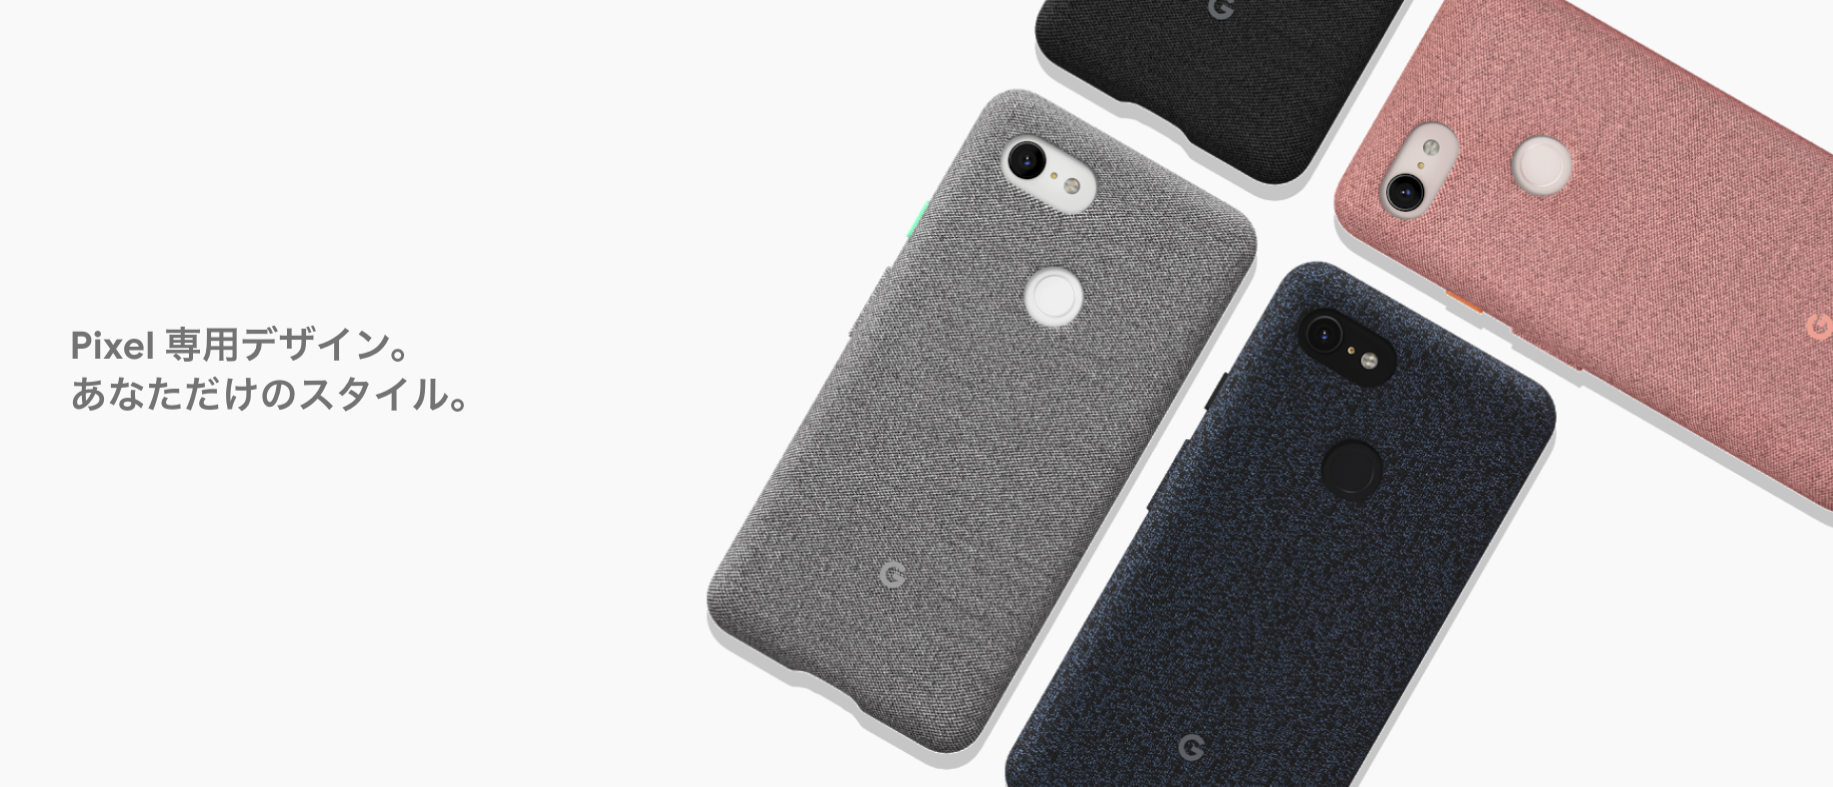 「Pixel 3」と「Pixel 3 XL」は専用保護ケースがリリースされます。